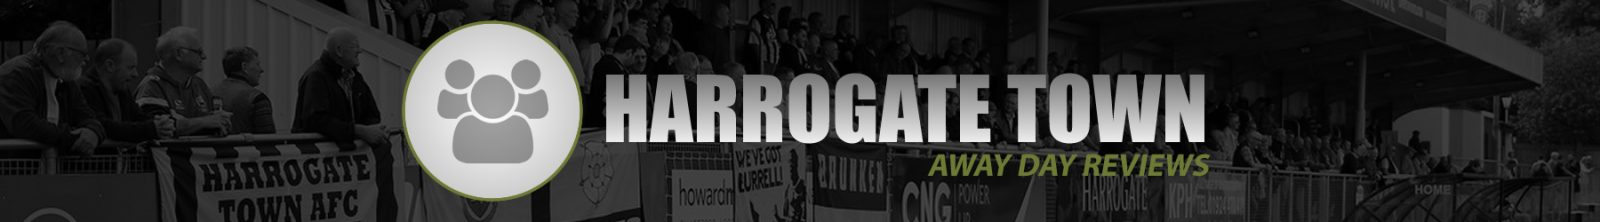 Review Harrogate Town